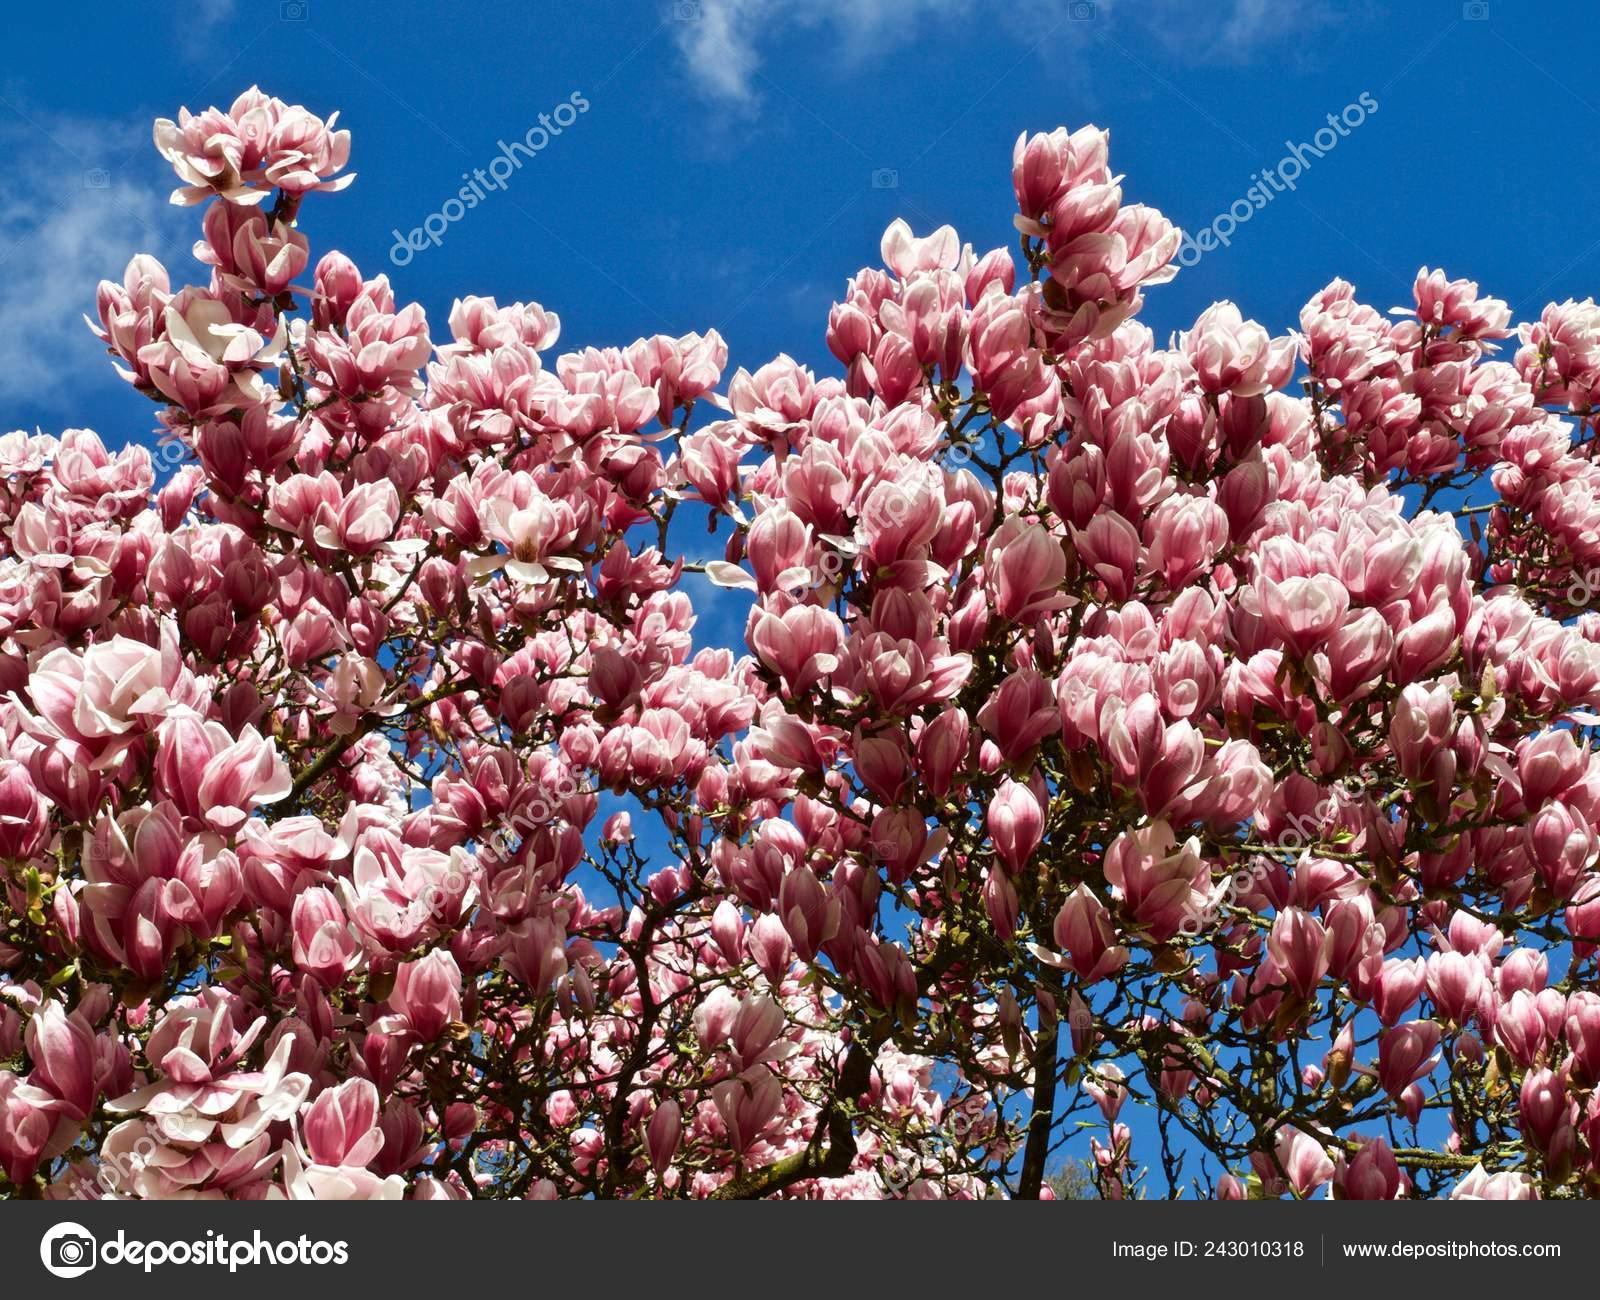 Big Magnolia Tree Blooming Full Pink Magnolia Blossoms Stock Photo